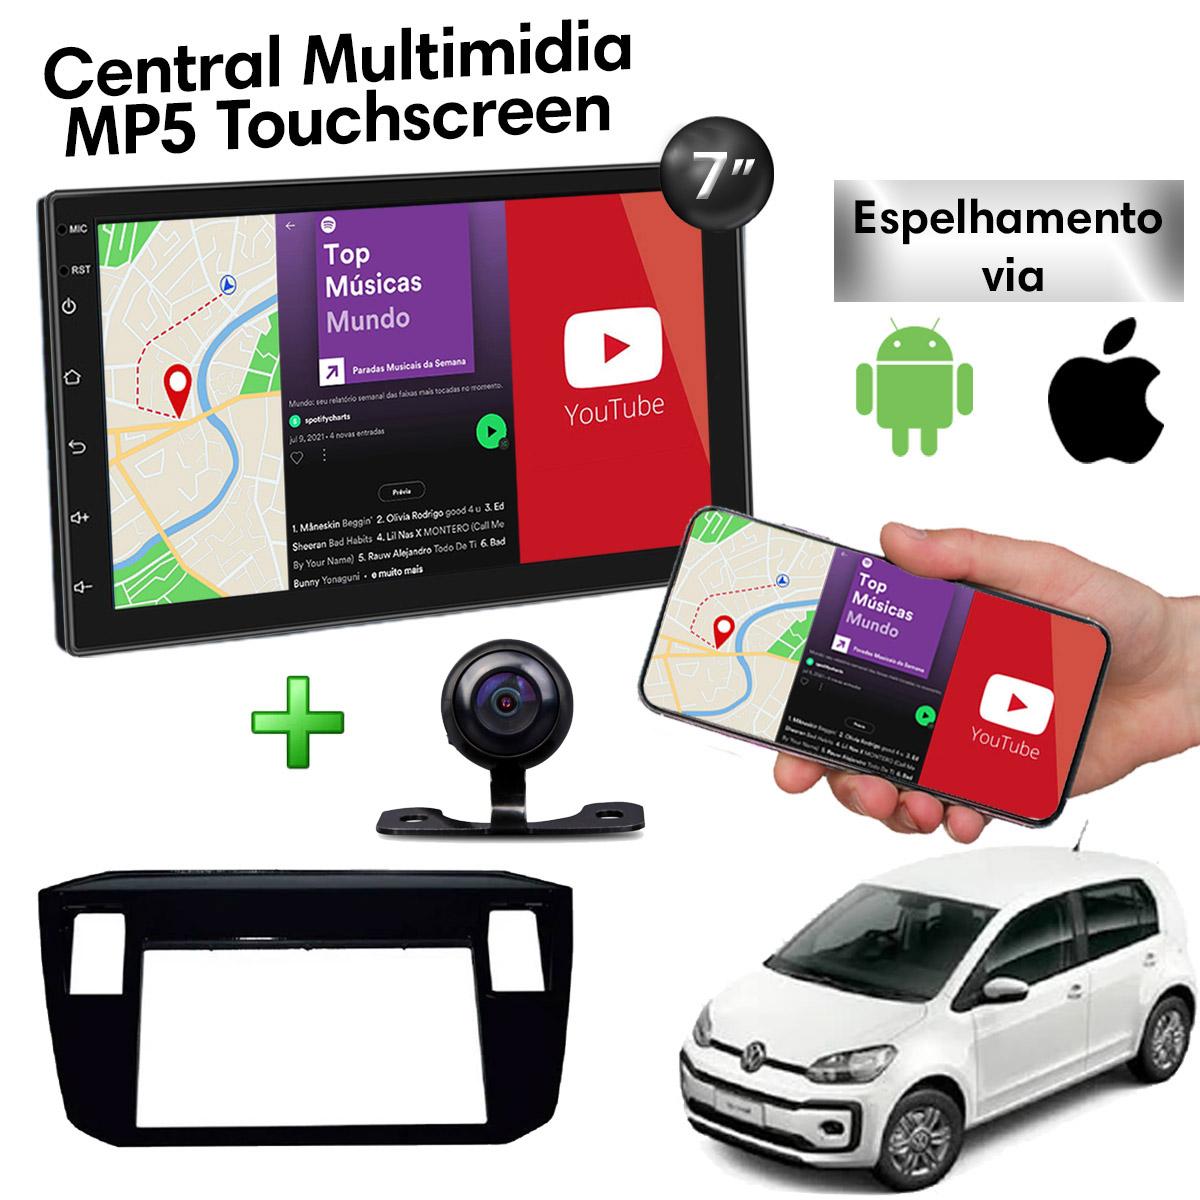 Central Multimidia com Moldura Volkswagen UP Mp5 Bluetooth Usb Touchscreen 7 Polegadas 2 Din Black Piano 2017 a 2020 Atacado